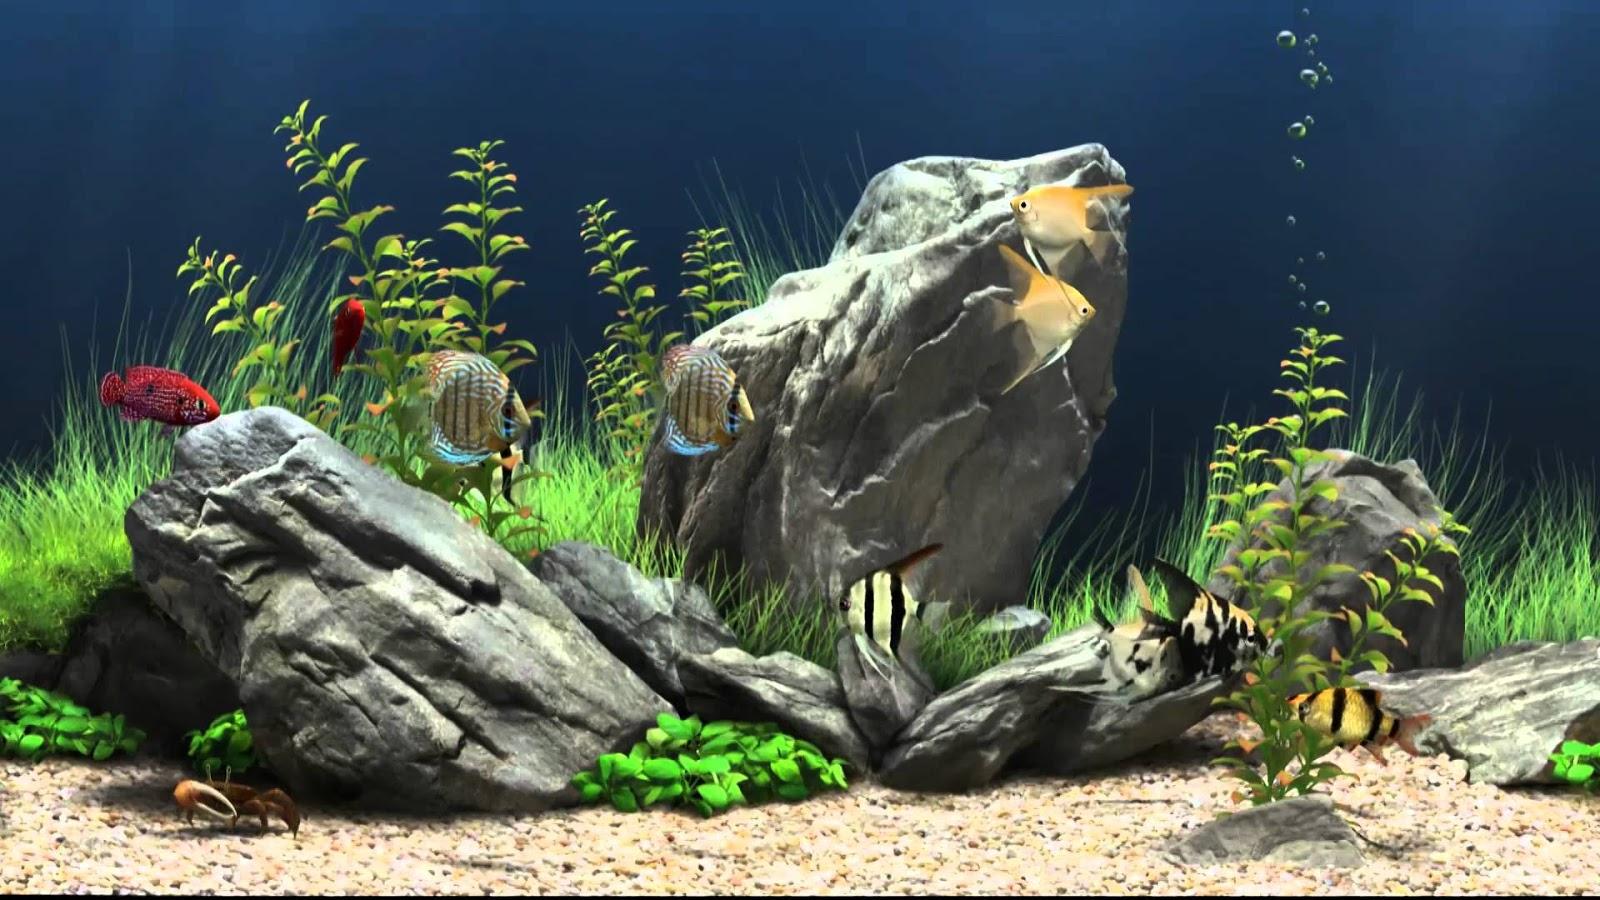 Fond d'écran fond marin animé gratuit - Fonds d'écran HD